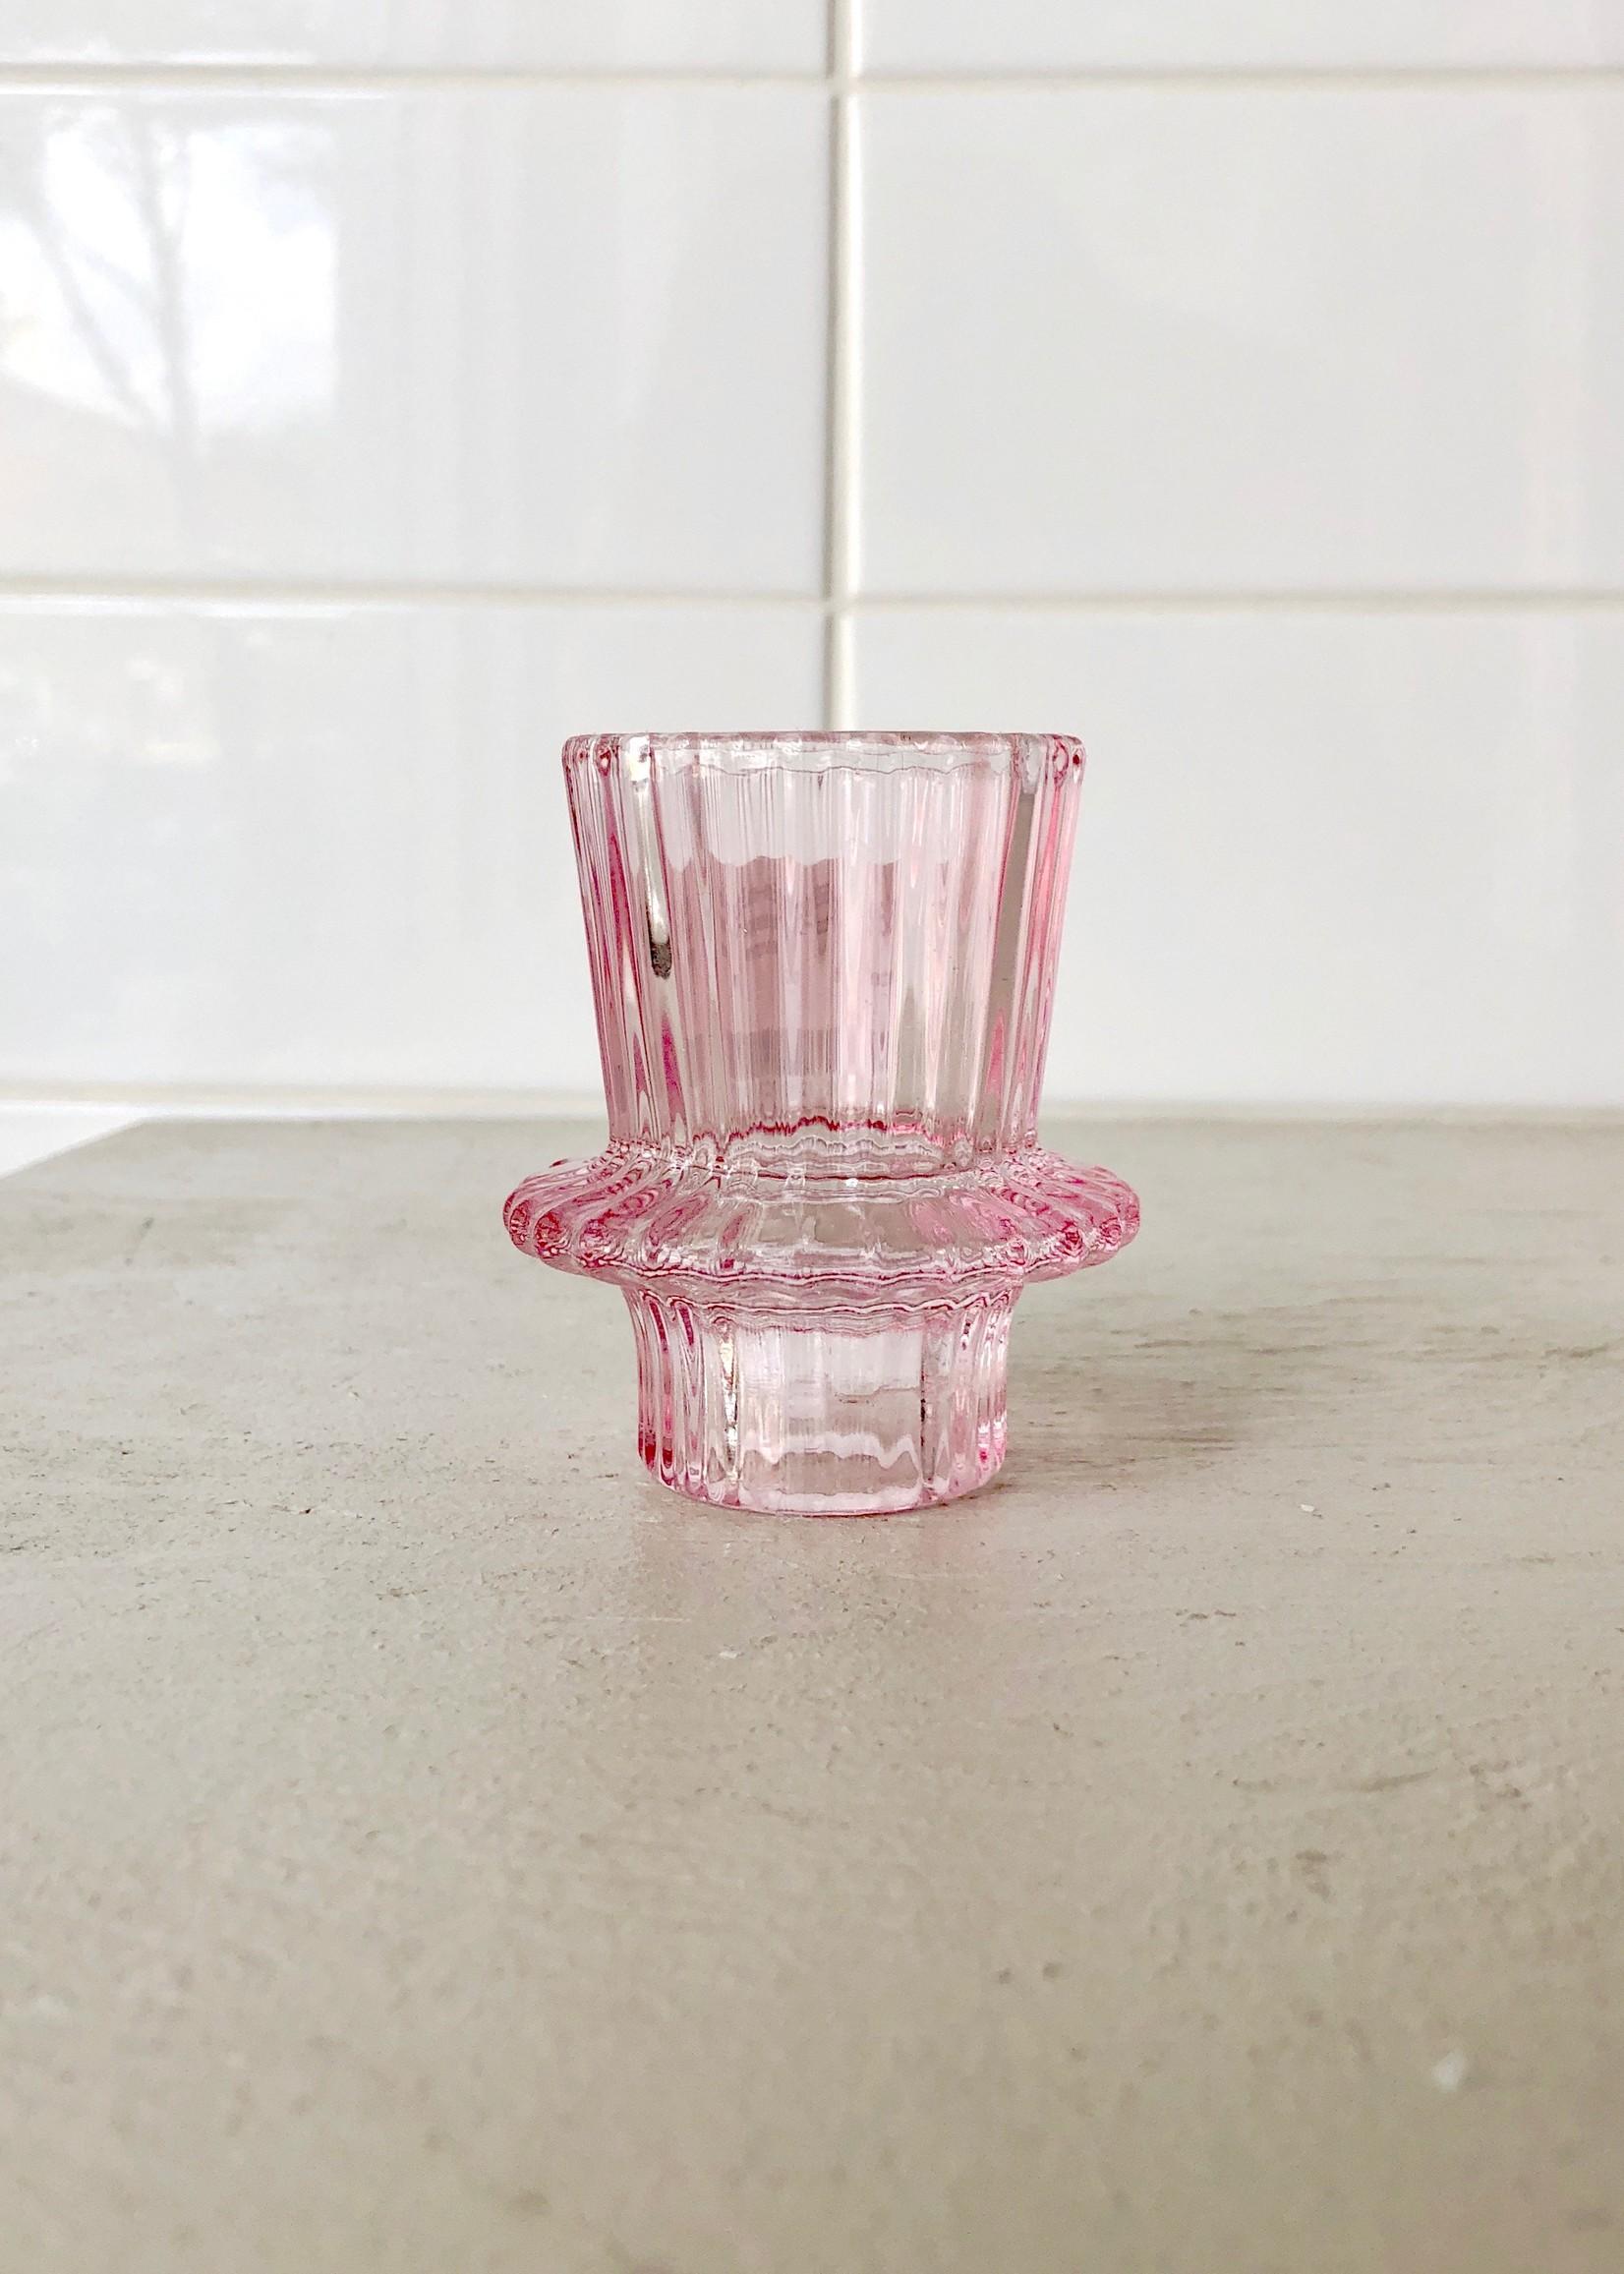 Annex Vintage Pink Glass Candle Holder by Annex Vintage